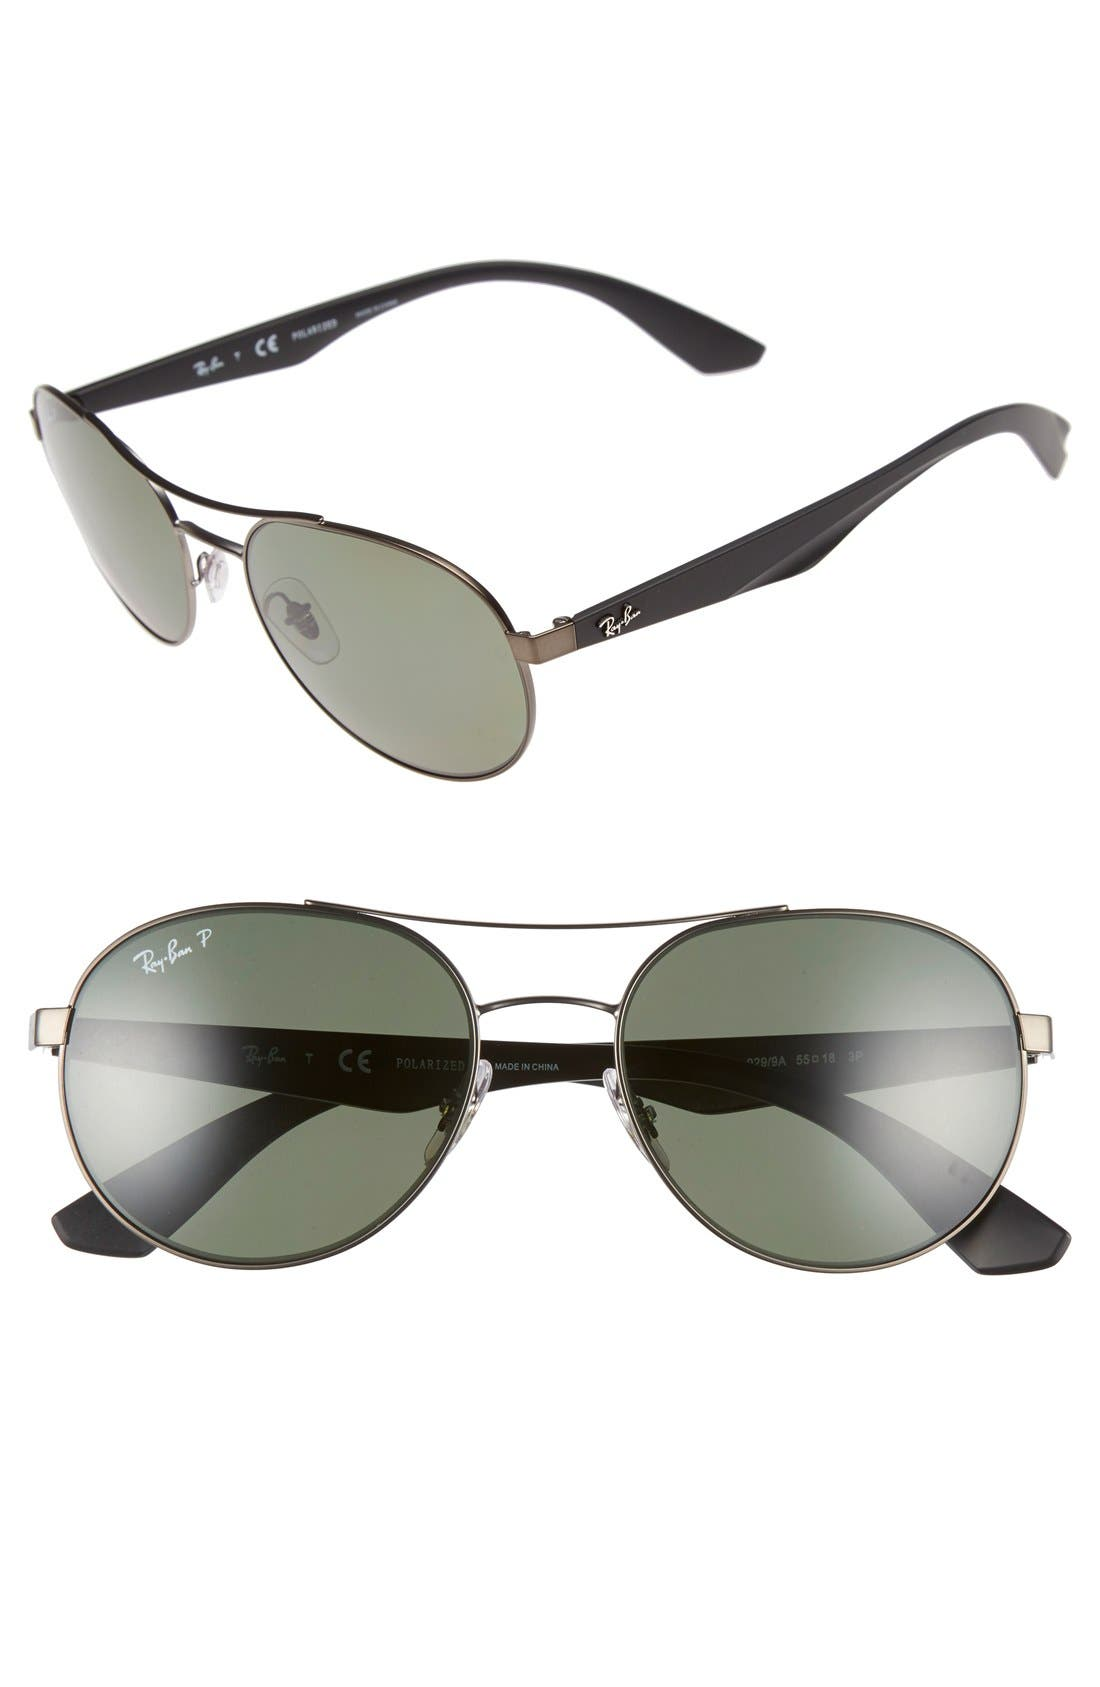 55mm Polarized Sunglasses,                             Main thumbnail 1, color,                             322